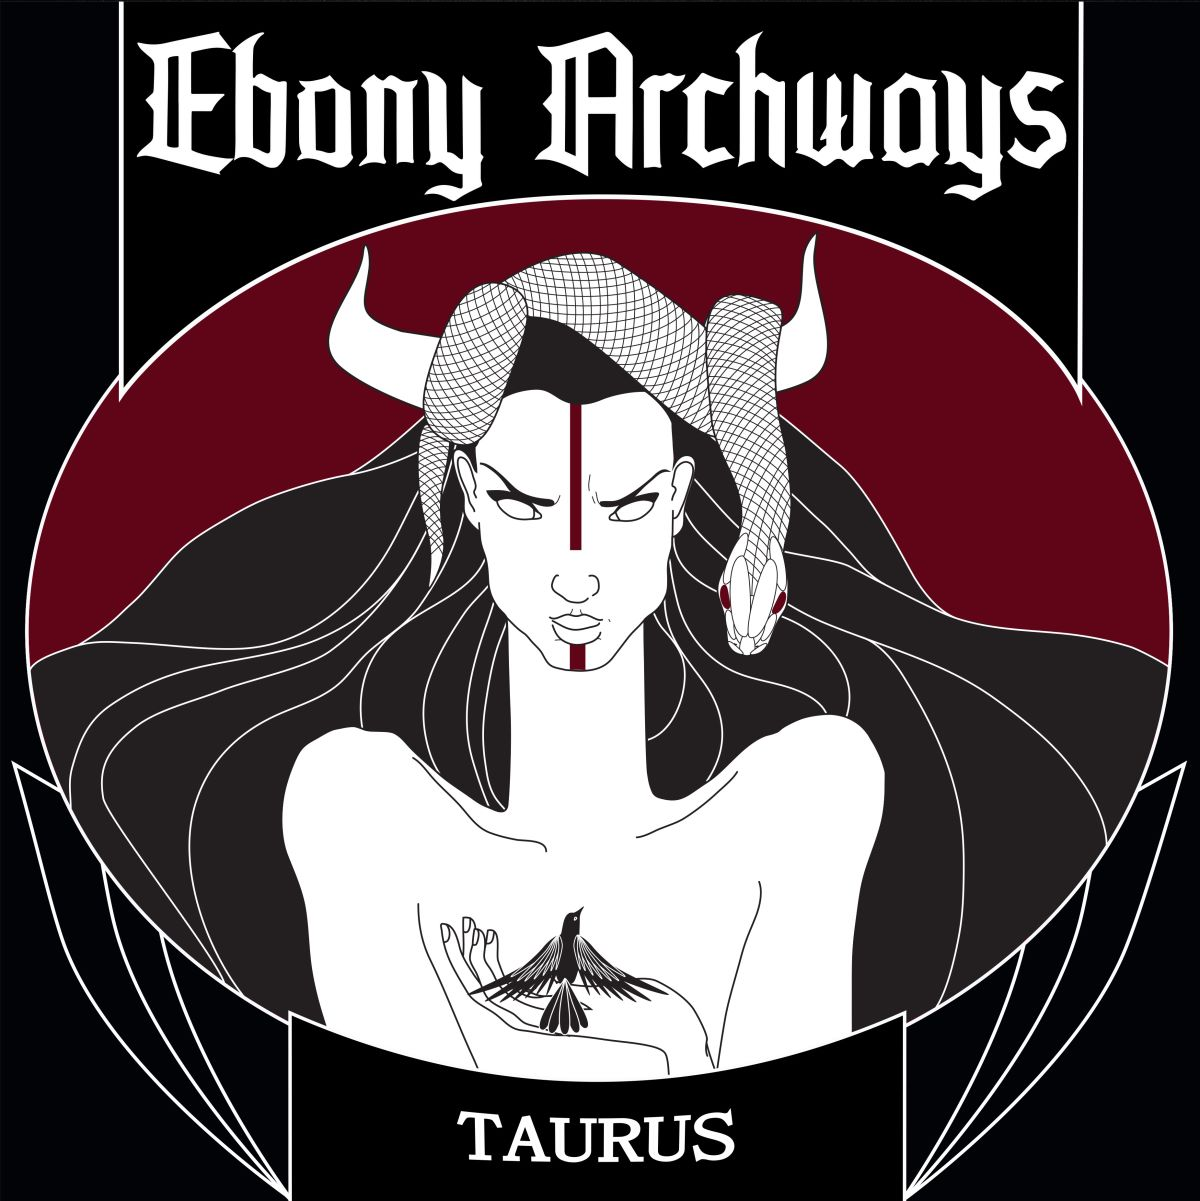 EBONY ARCHWAYS - Taurus - album cover